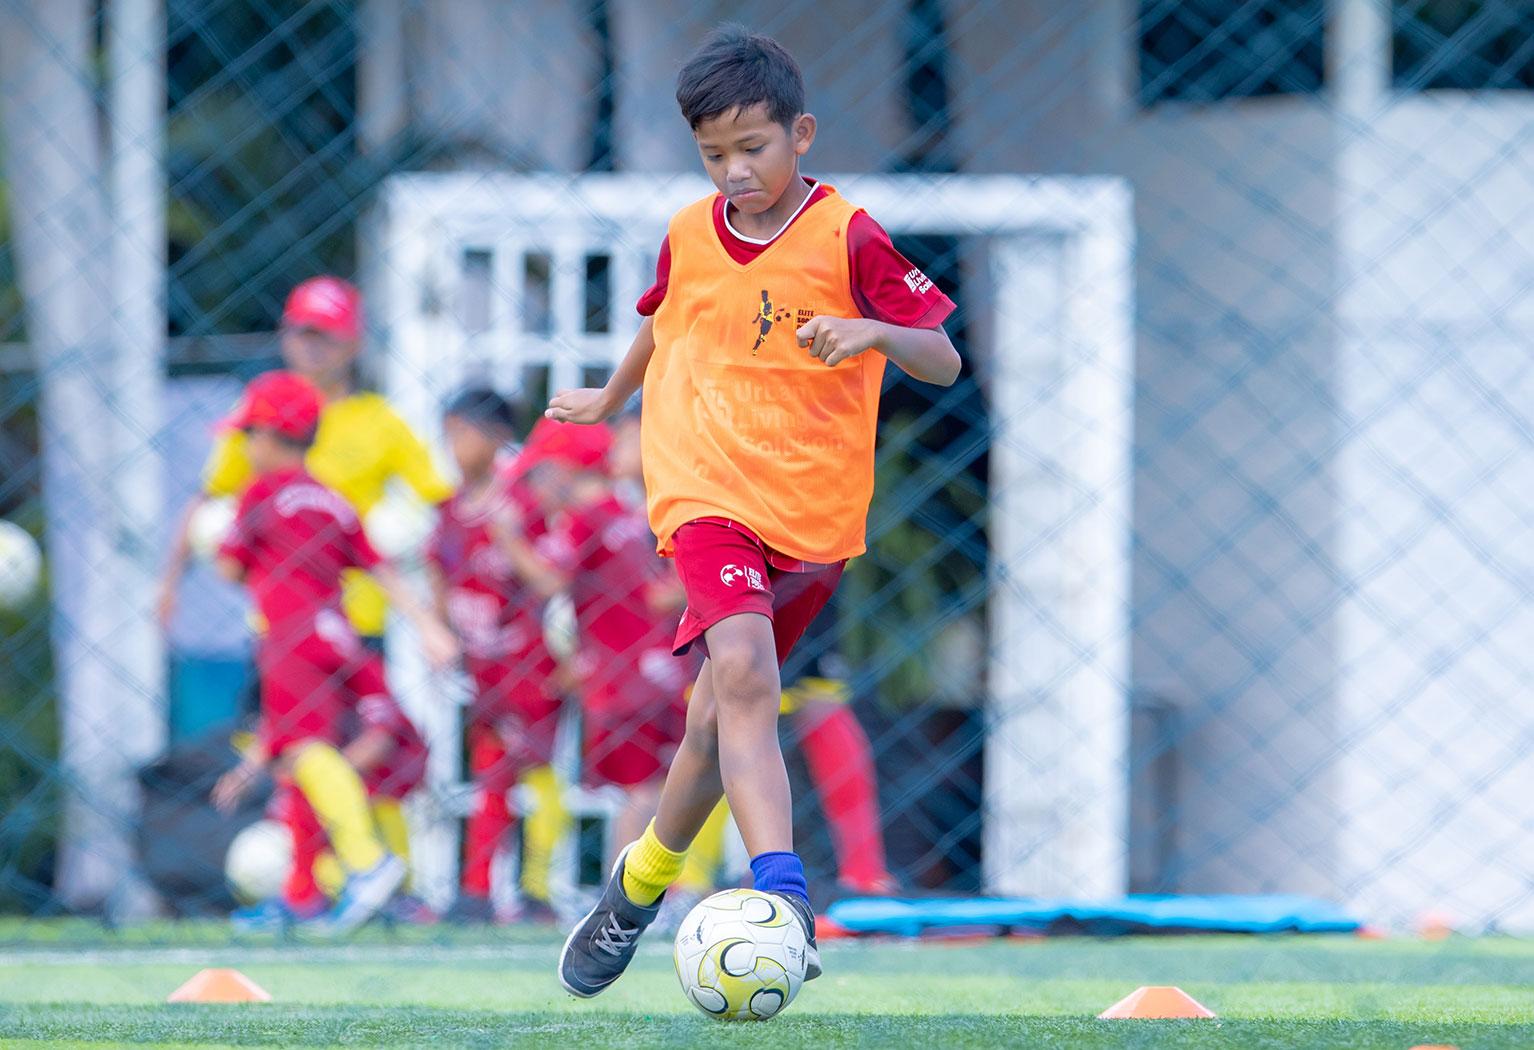 elite-soccer-coaching-football-school-cambodia-8-10